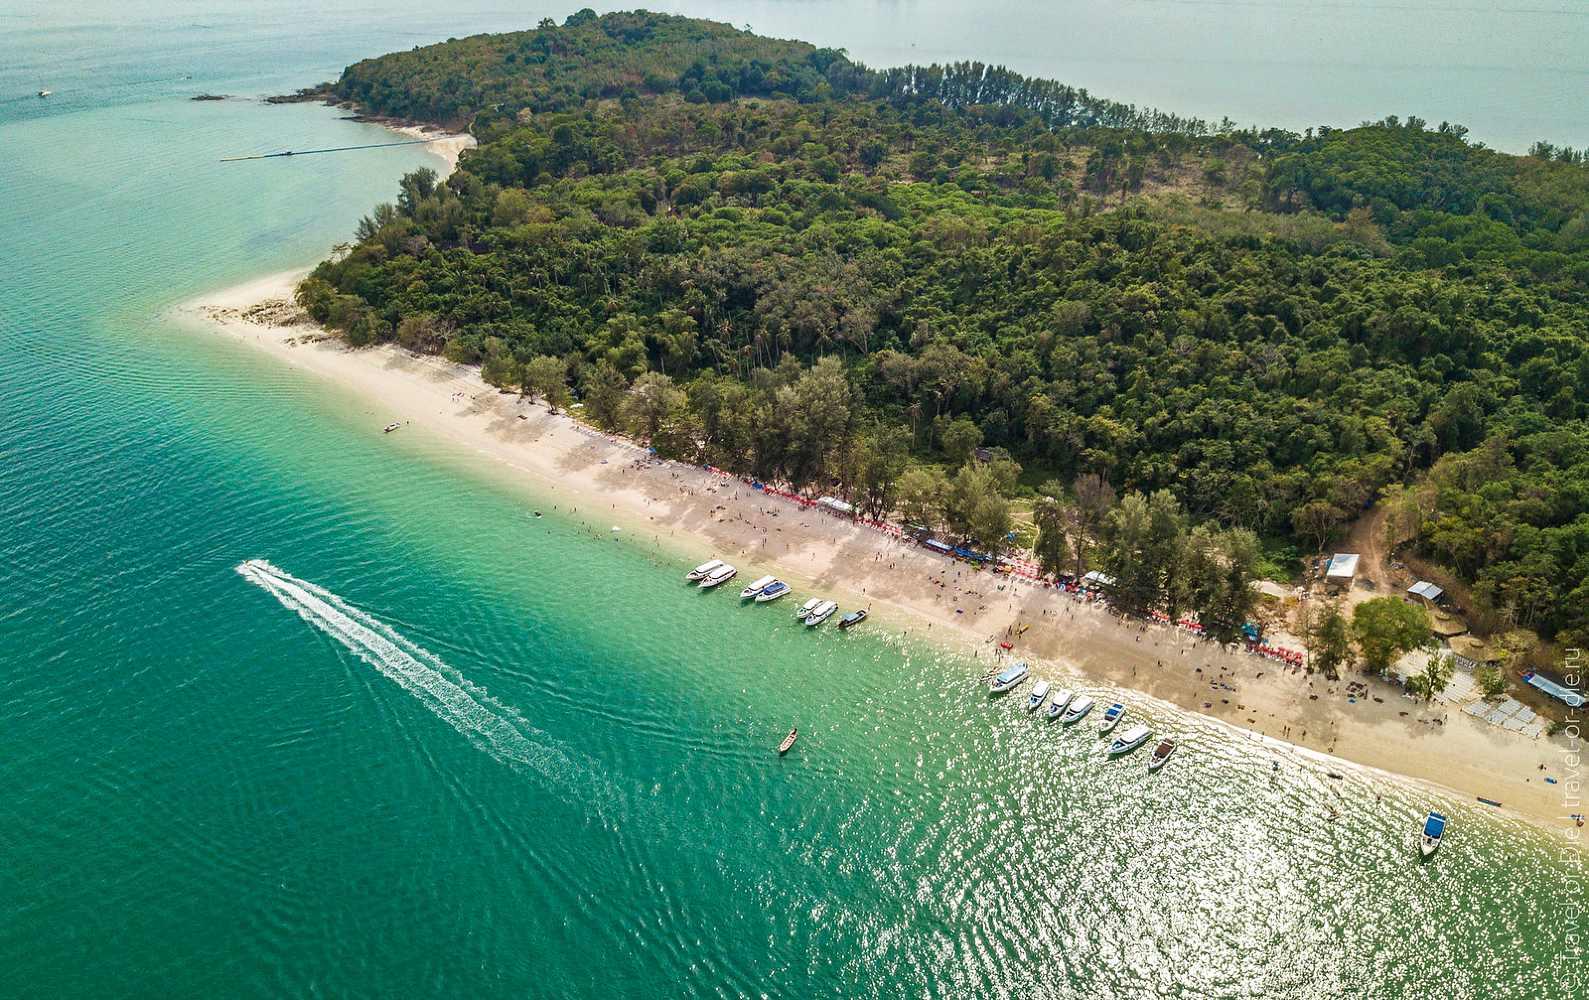 Relaxen op Naka Island, wit strand en helder water